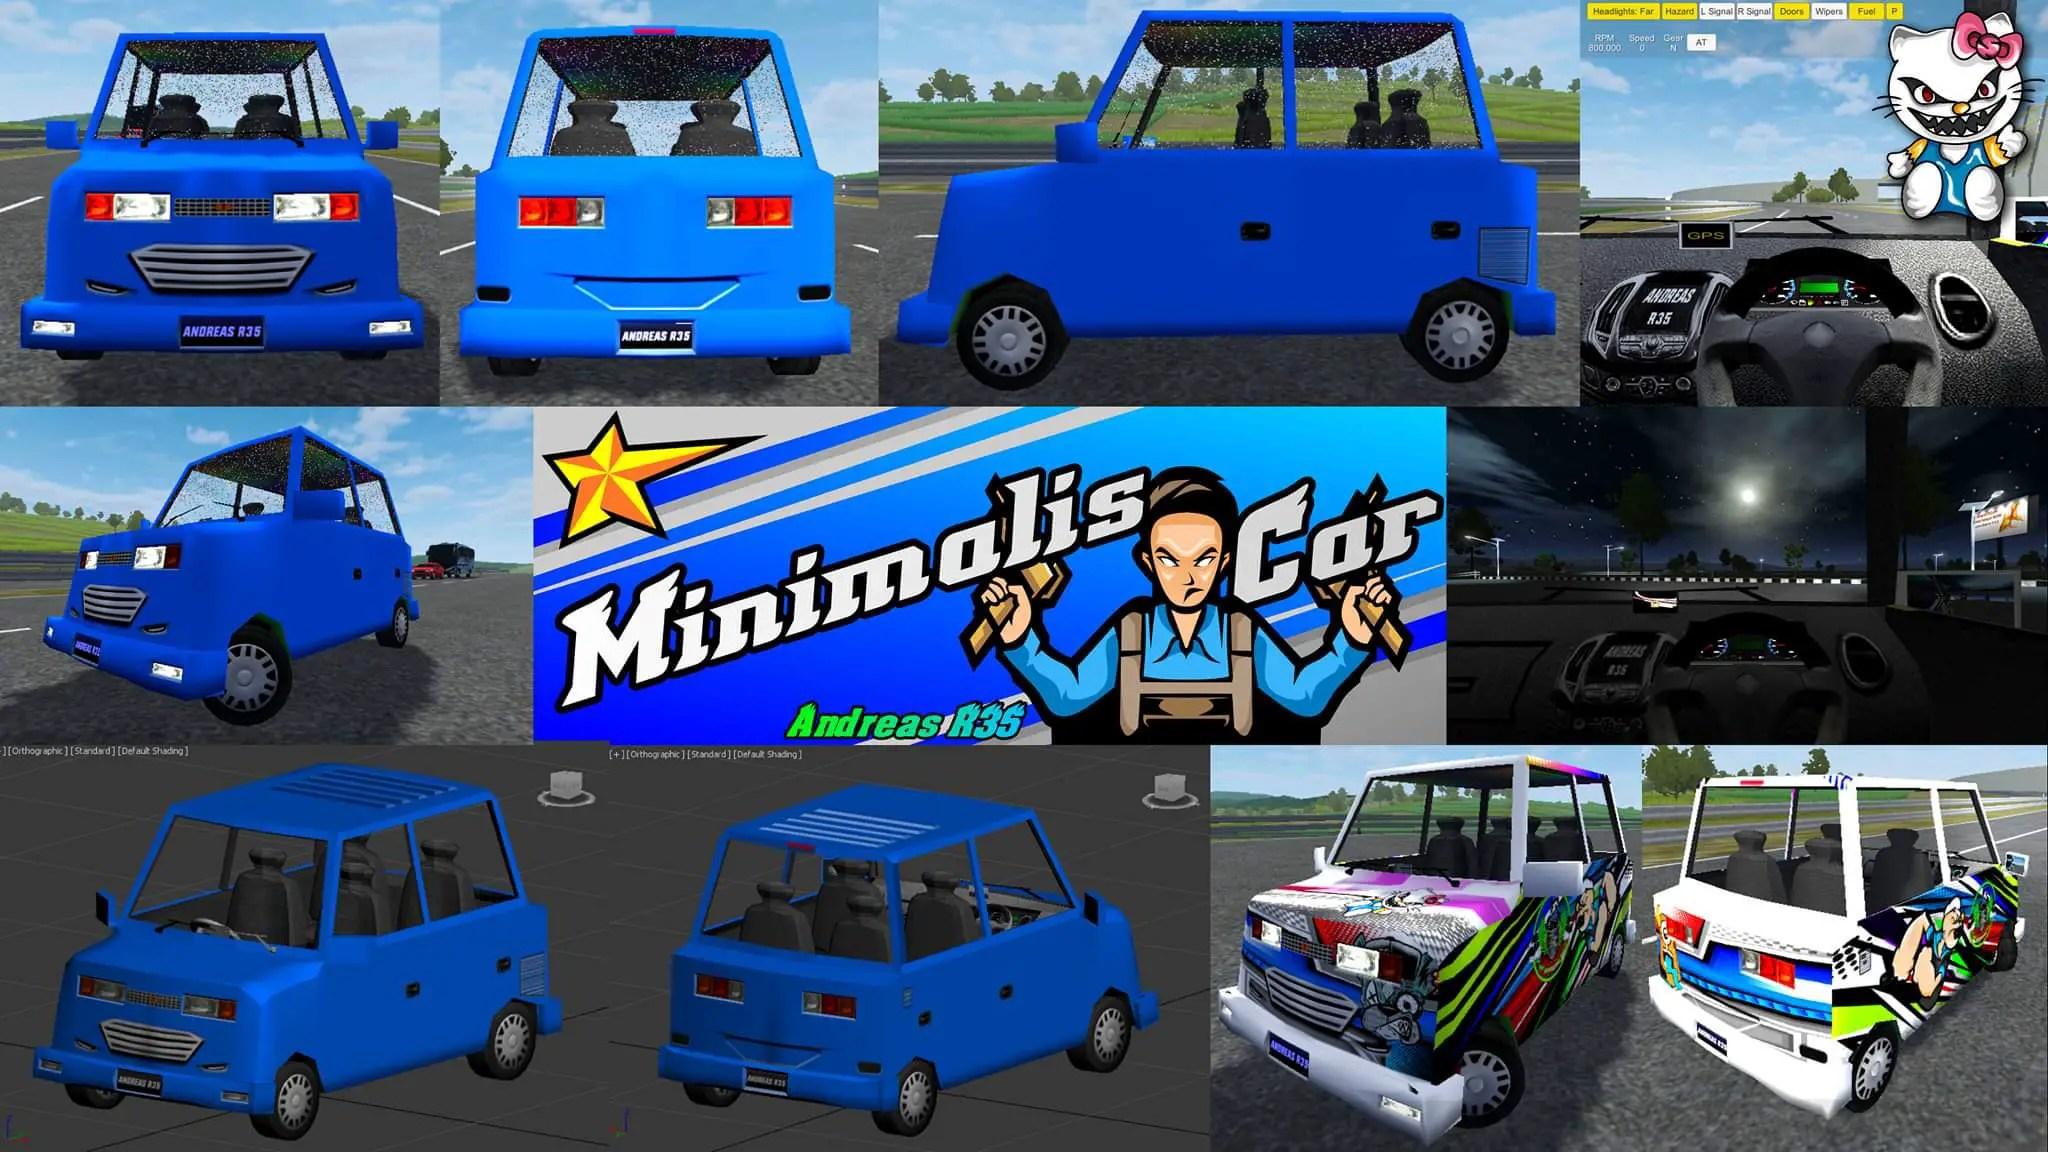 Download Minimalis Car Mod for Bus Simulator Indonesia, , Bus Mod, Bus Simulator Indonesia Mod, BUSSID mod, Car Mod, SGCArena, Vehicle Mod